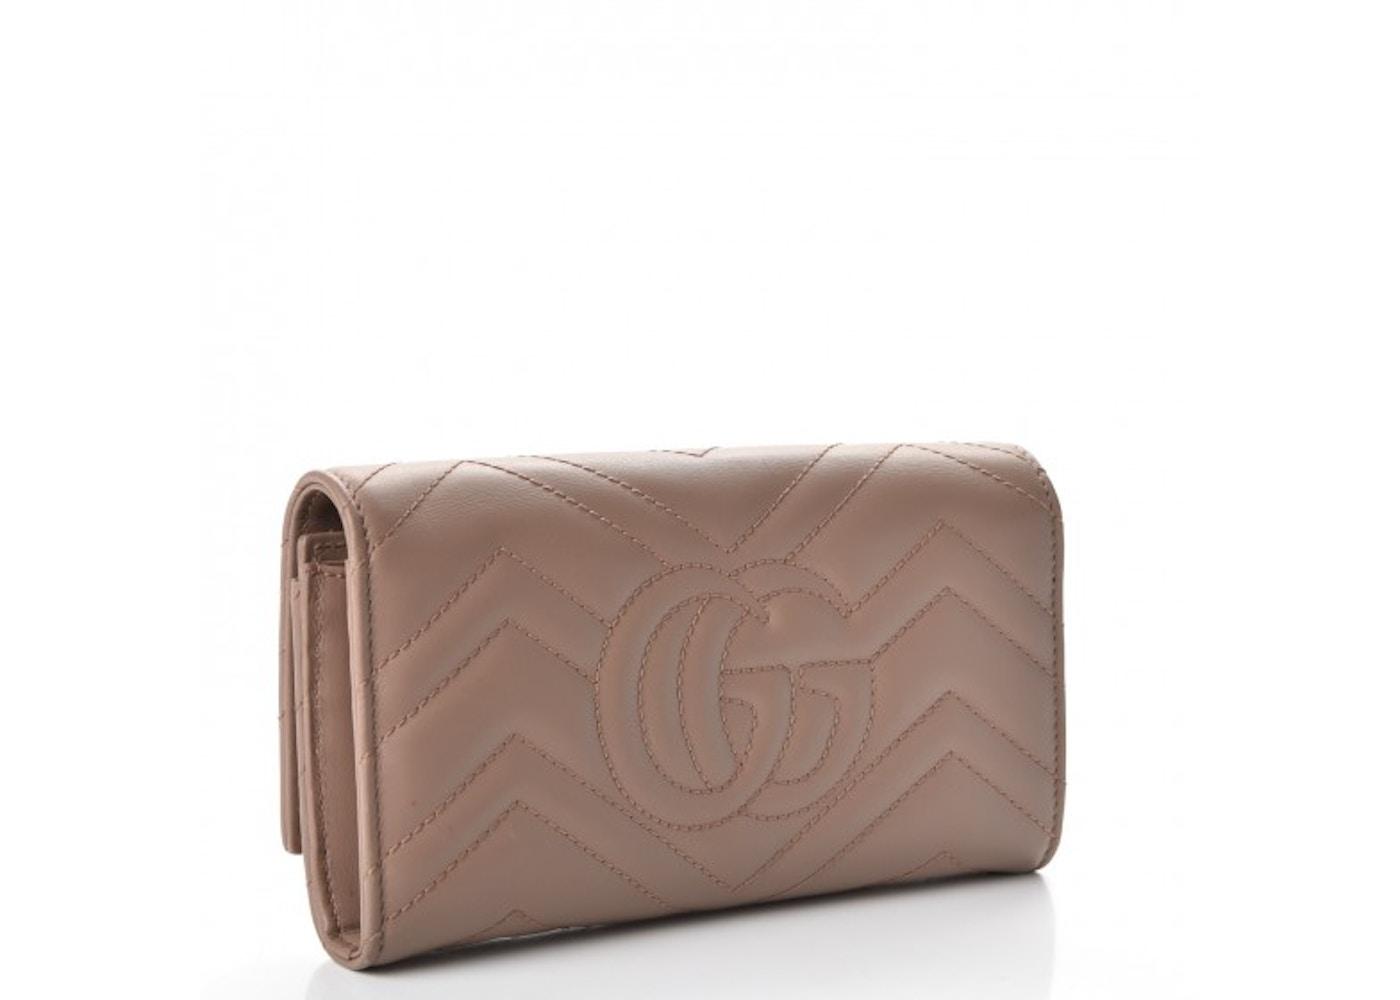 Replica Gucci Pearl Logo Snake Pattern GG Marmont